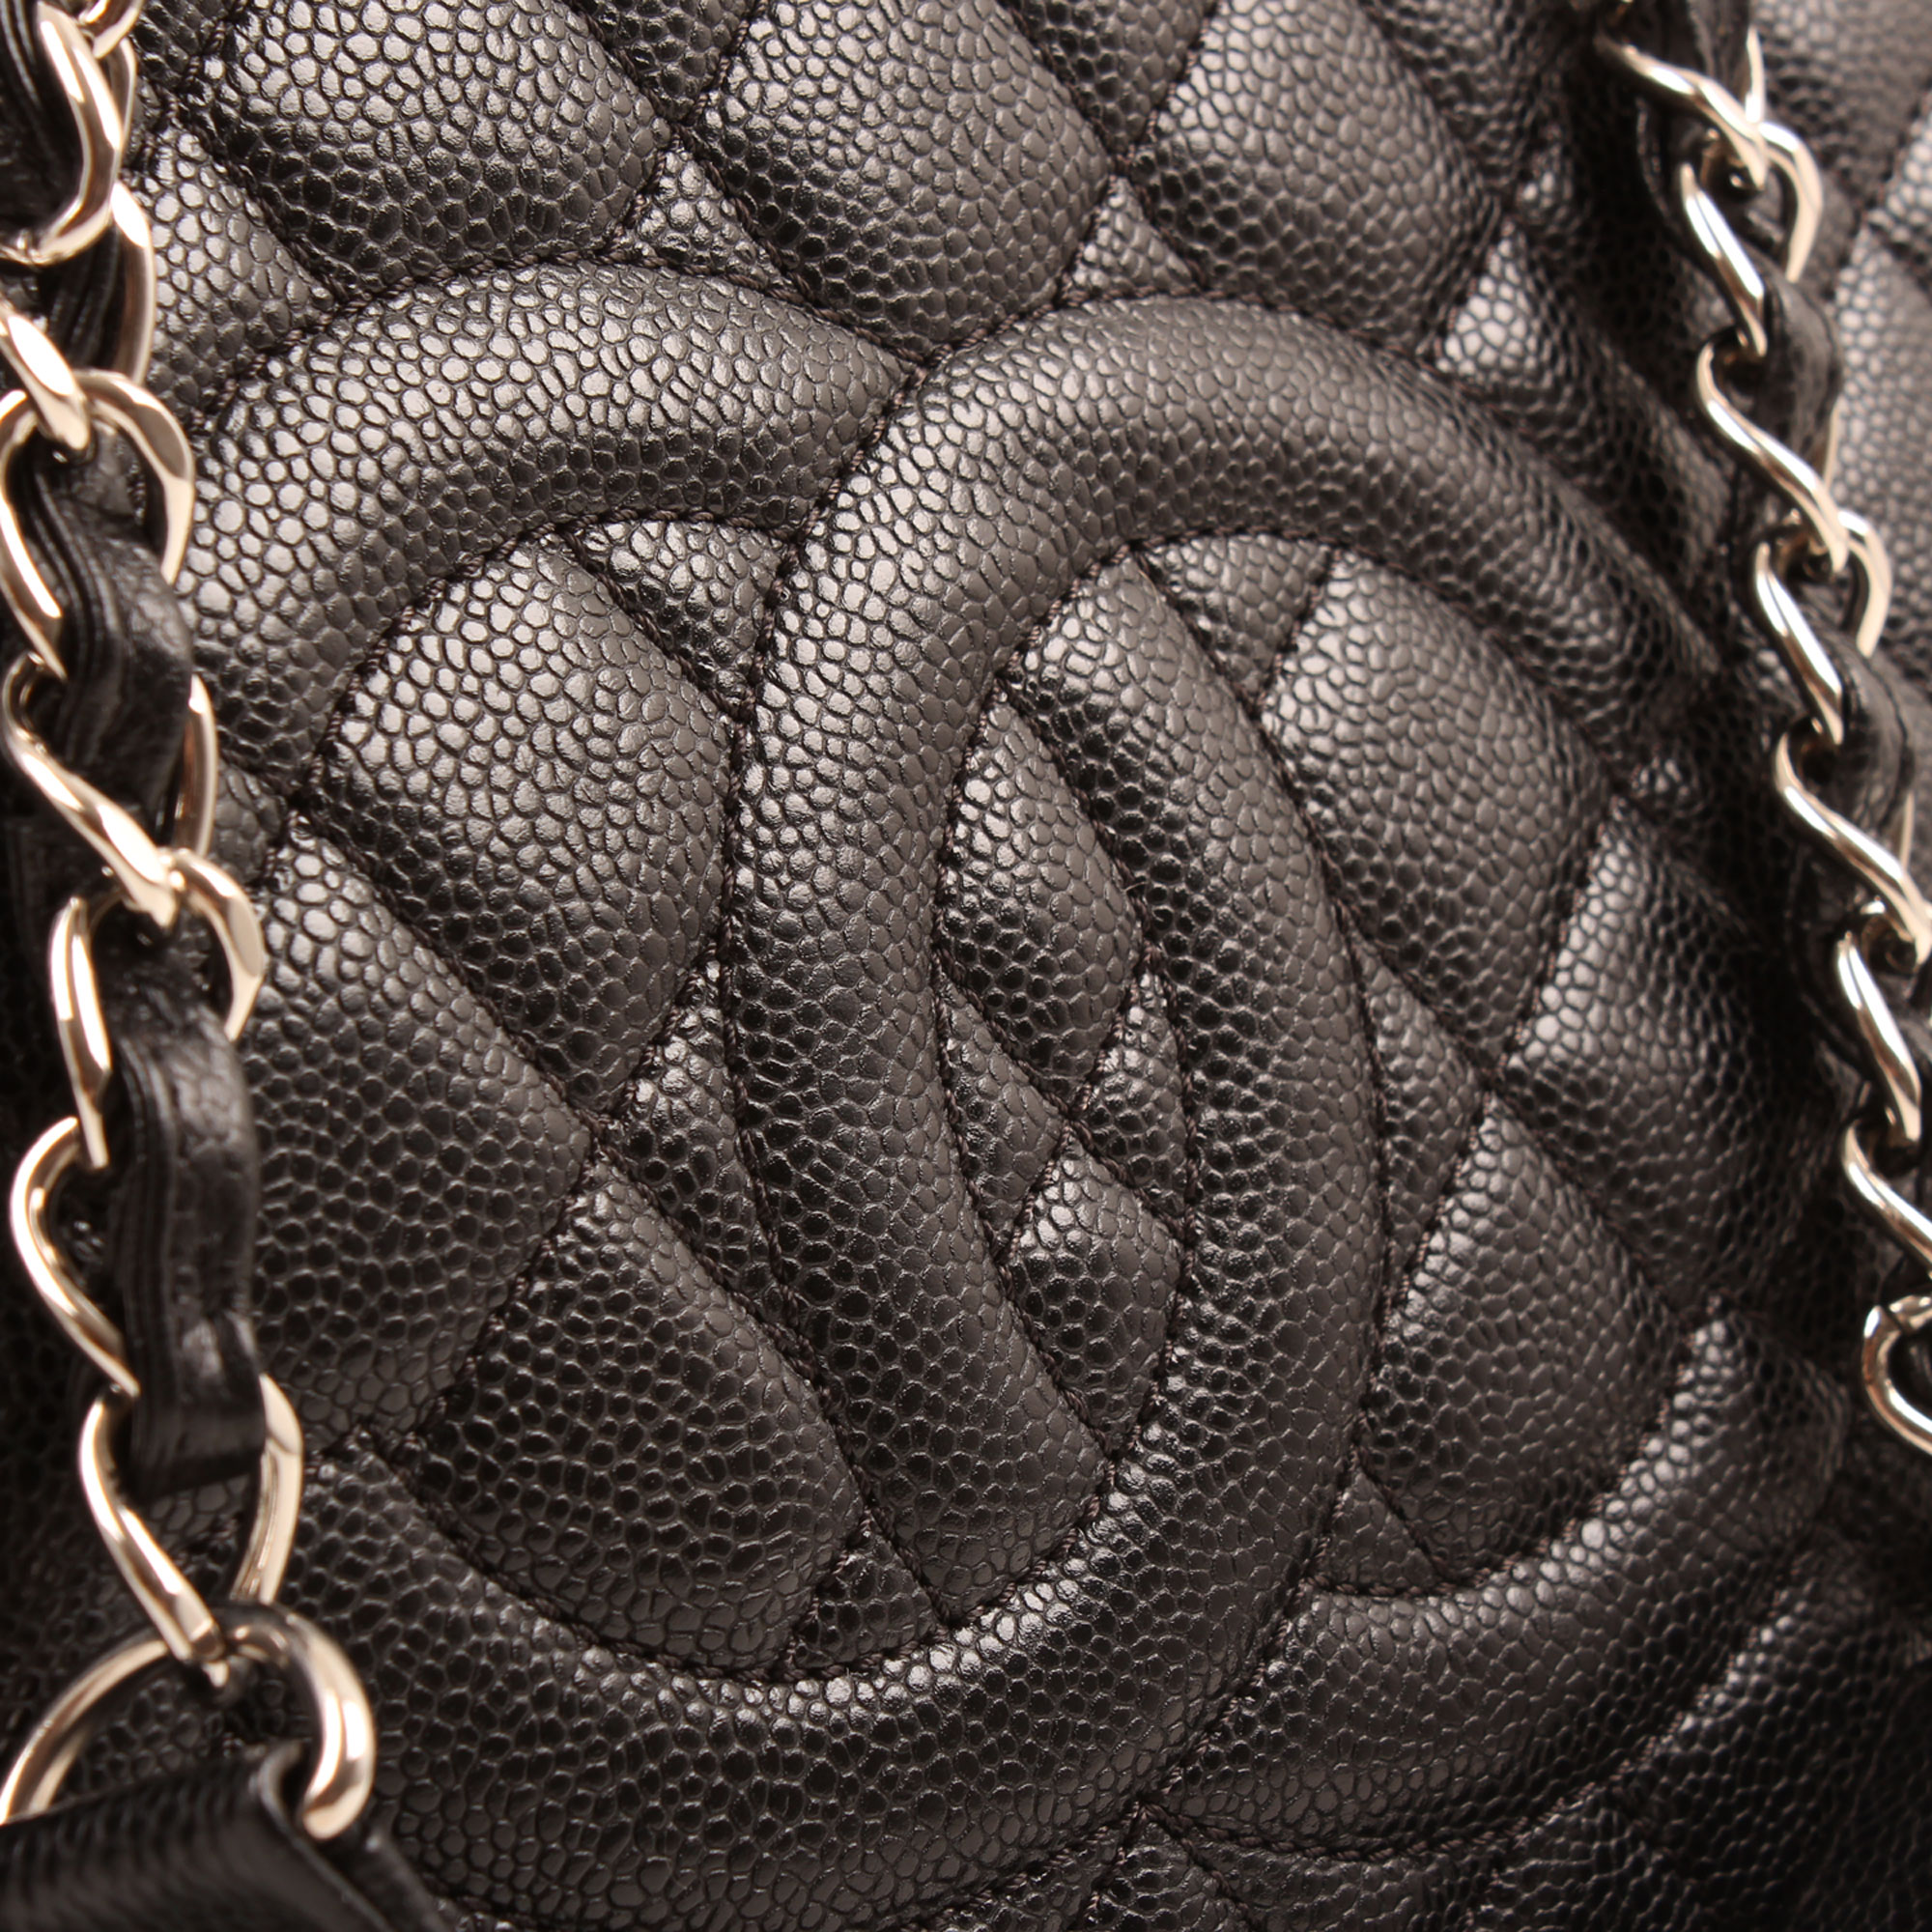 Imagen de detalle de la piel del bolso chanel grand shopping tote caviar negro